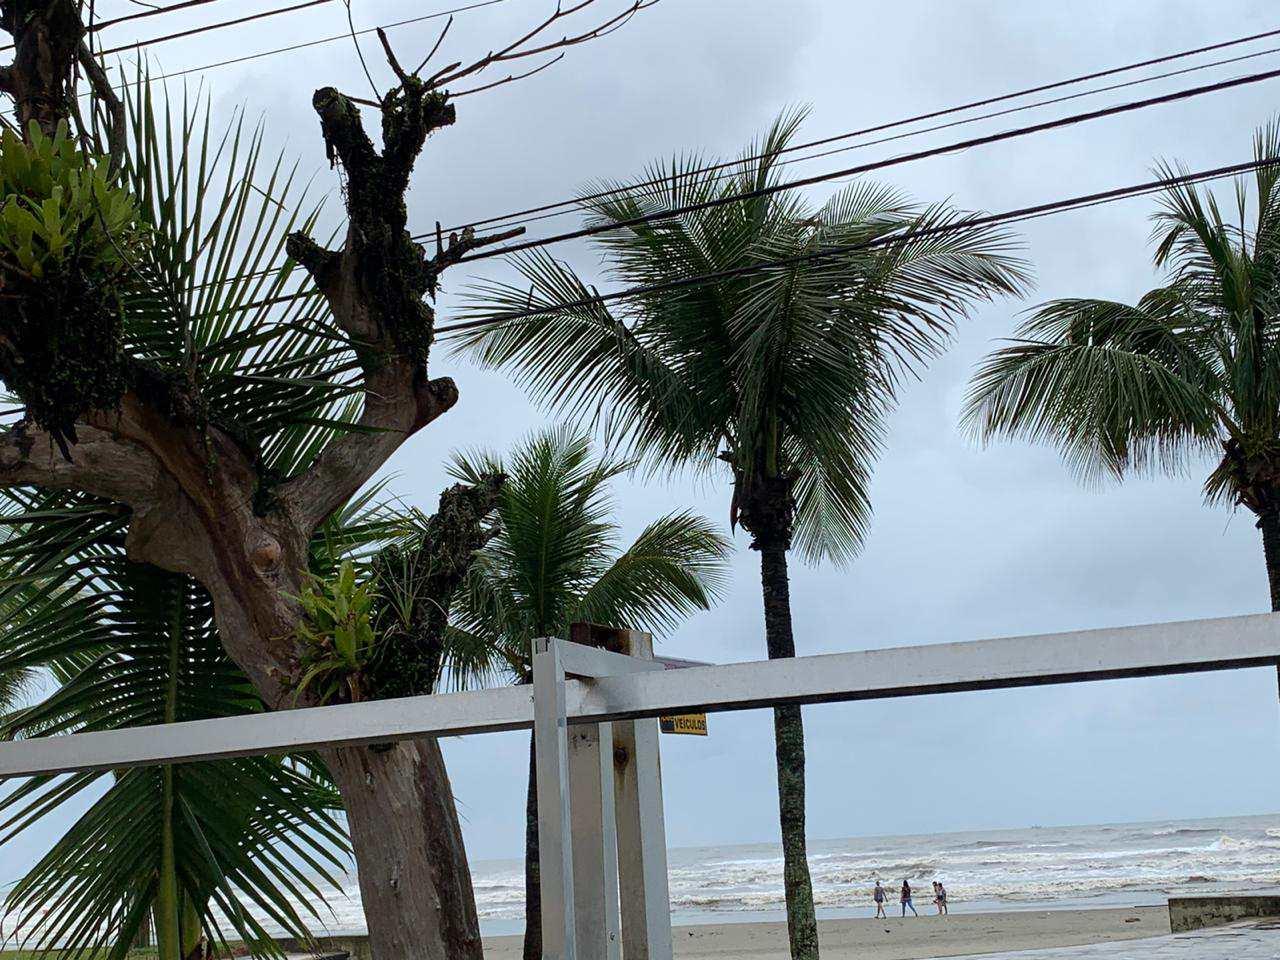 Kitnet com 1 dorm, Caiçara, Praia Grande - R$ 110 mil, Cod: 5447